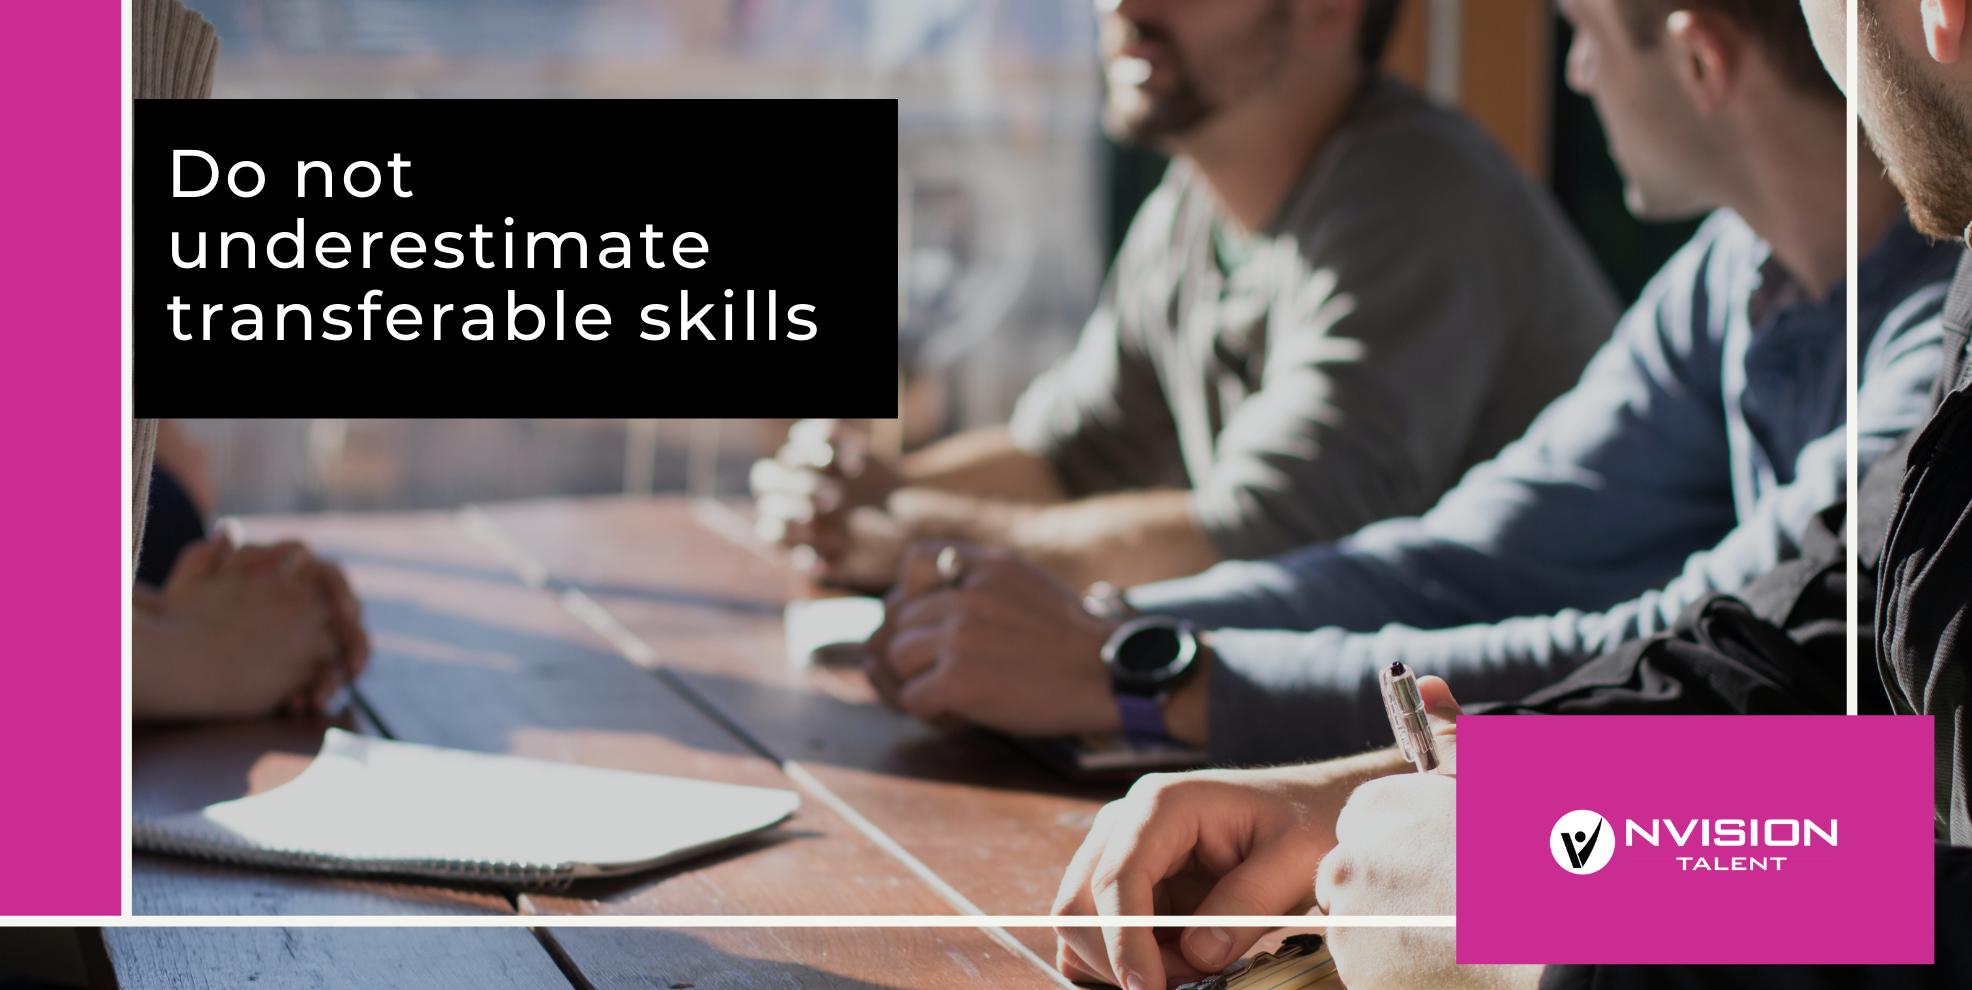 Do not underestimate transferable skills